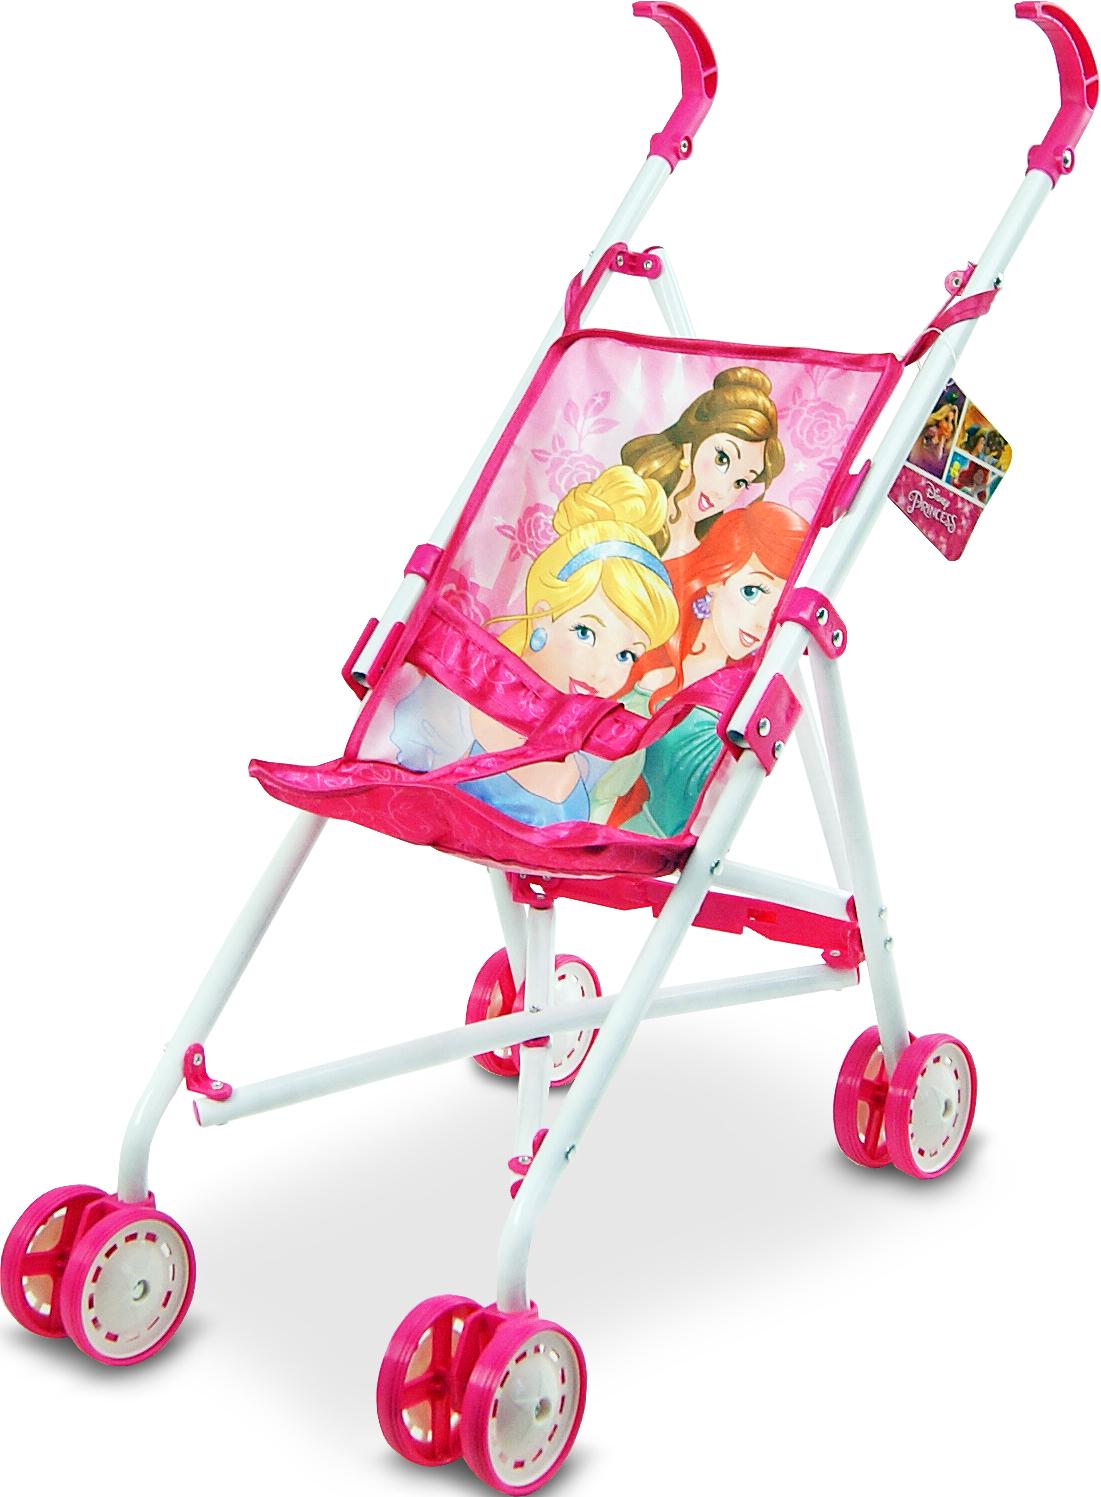 Коляска Disney Princess Арт.: D1001P (летняя, 8 колес, крутящиеся)